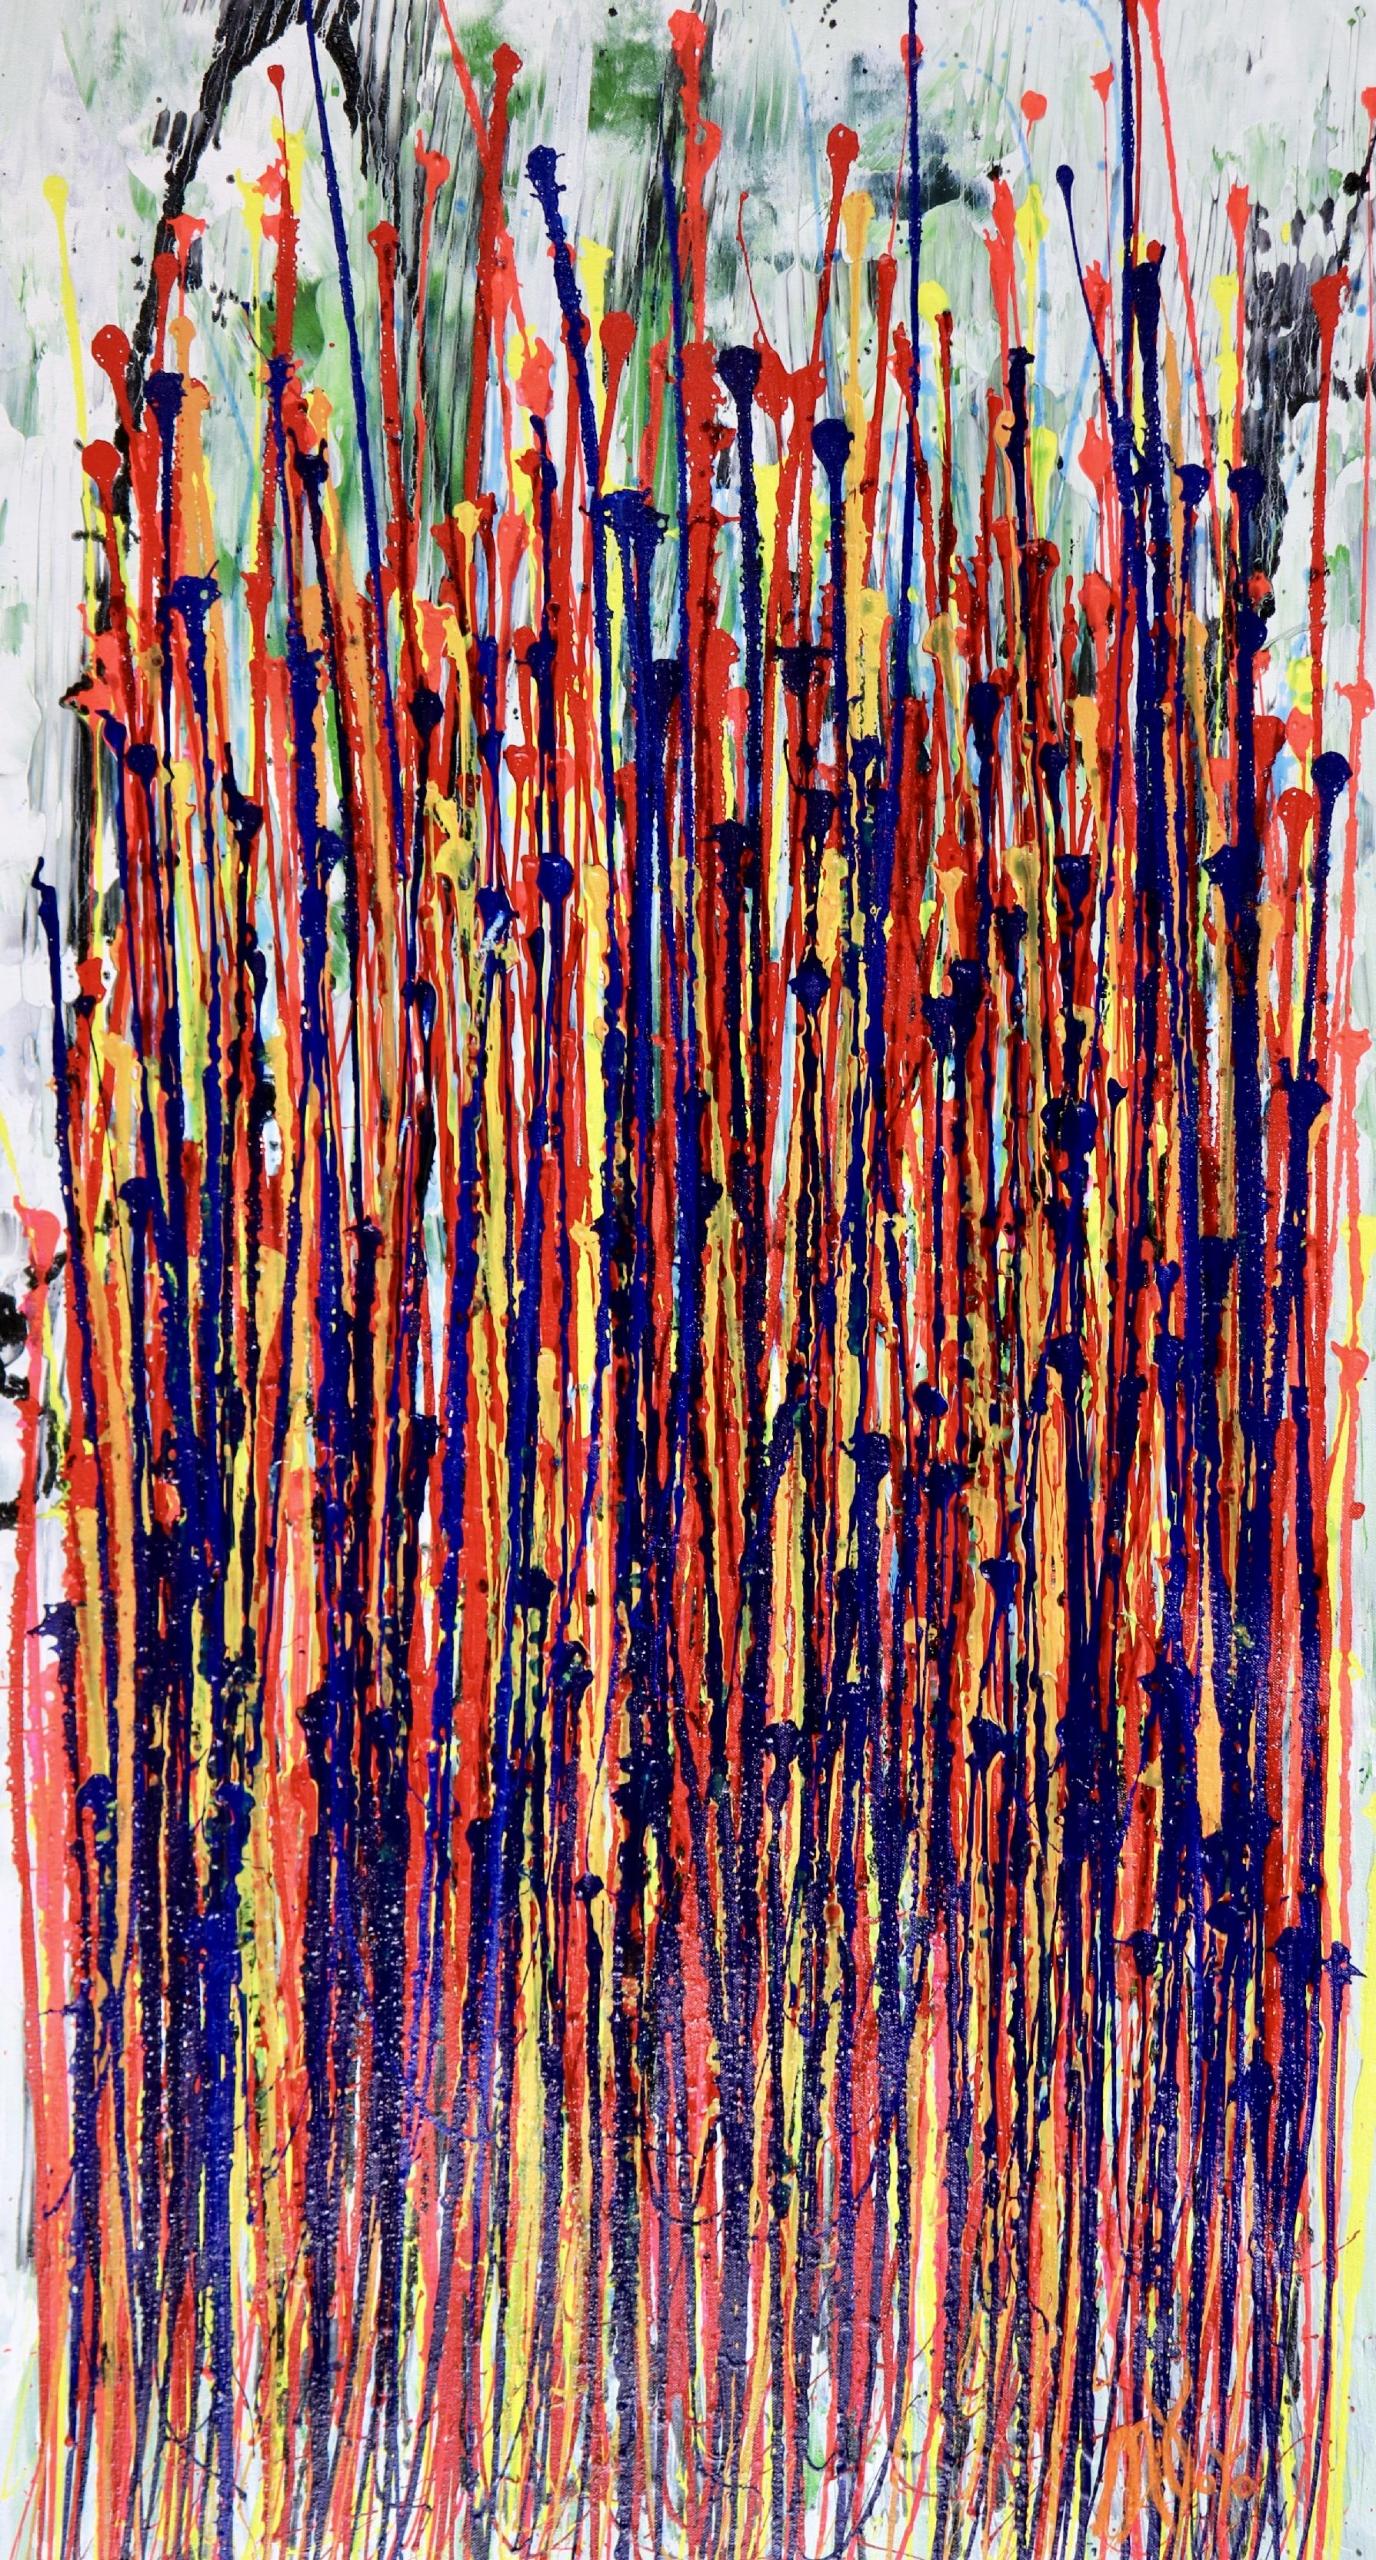 SOLD - Illuminating Garden Spectra 3 (2020) Abstract painting by Nestor Toro